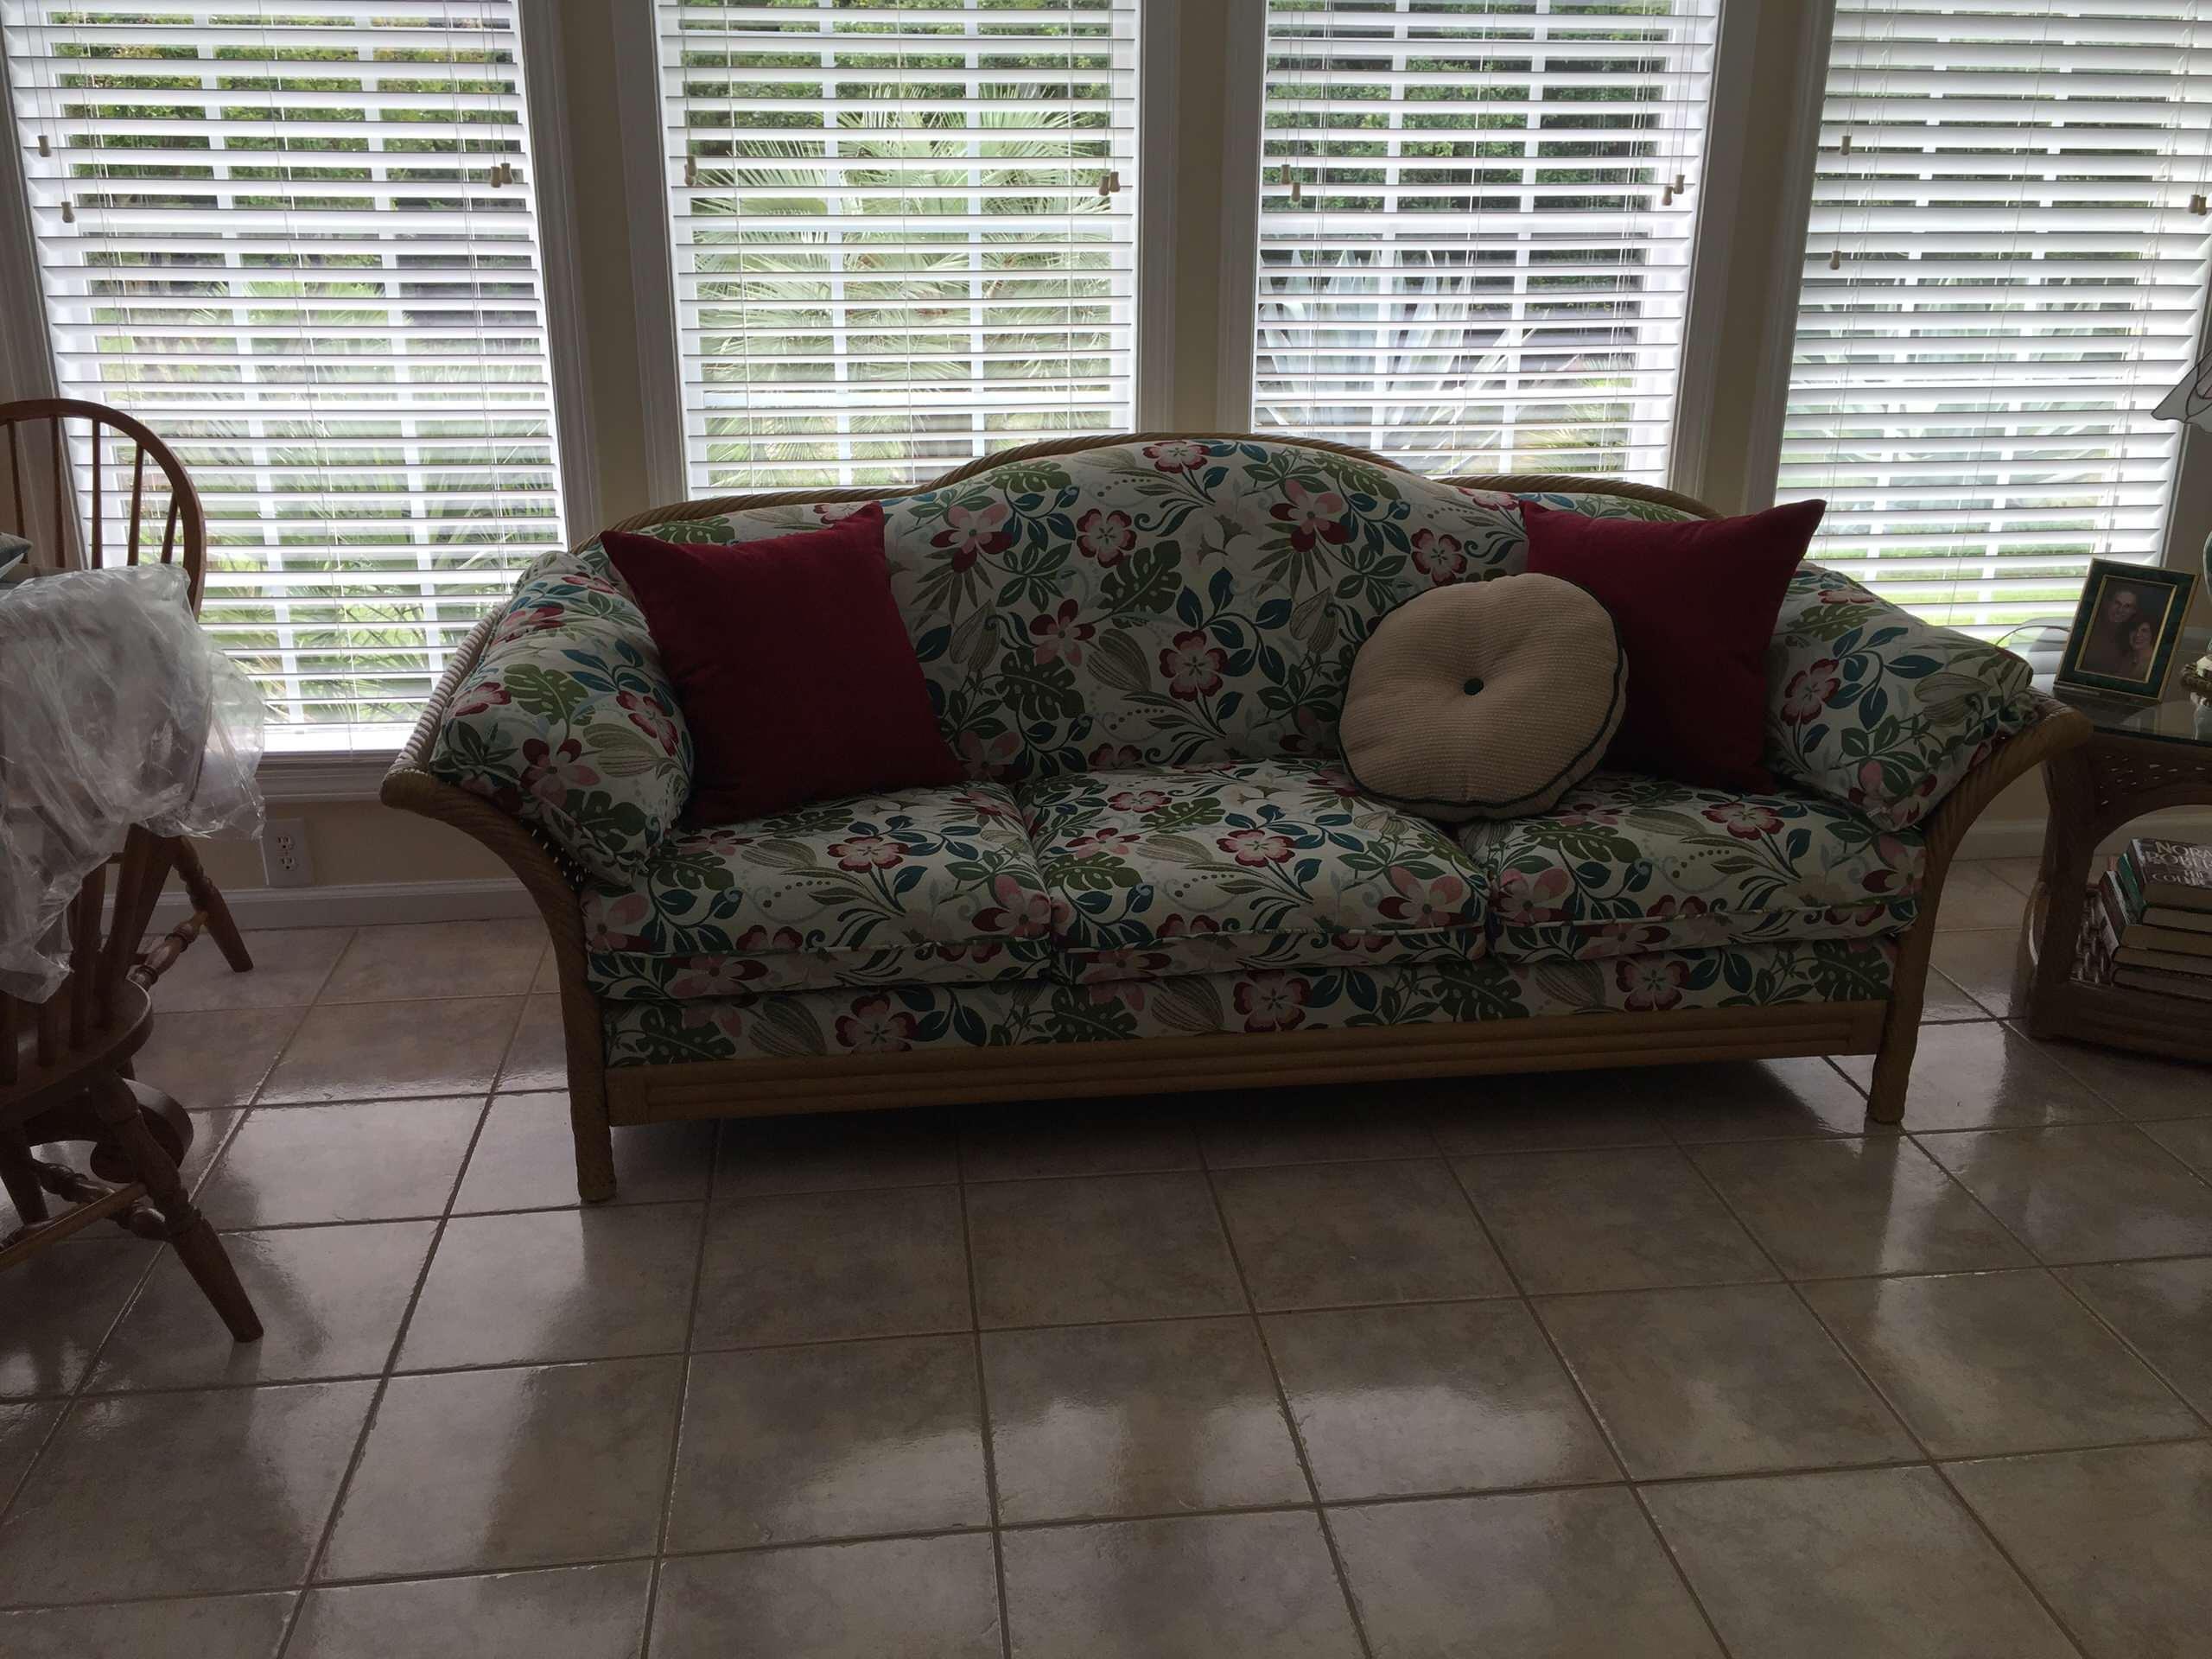 Slipcovers/Reupholstery with Sunbrella fabrics